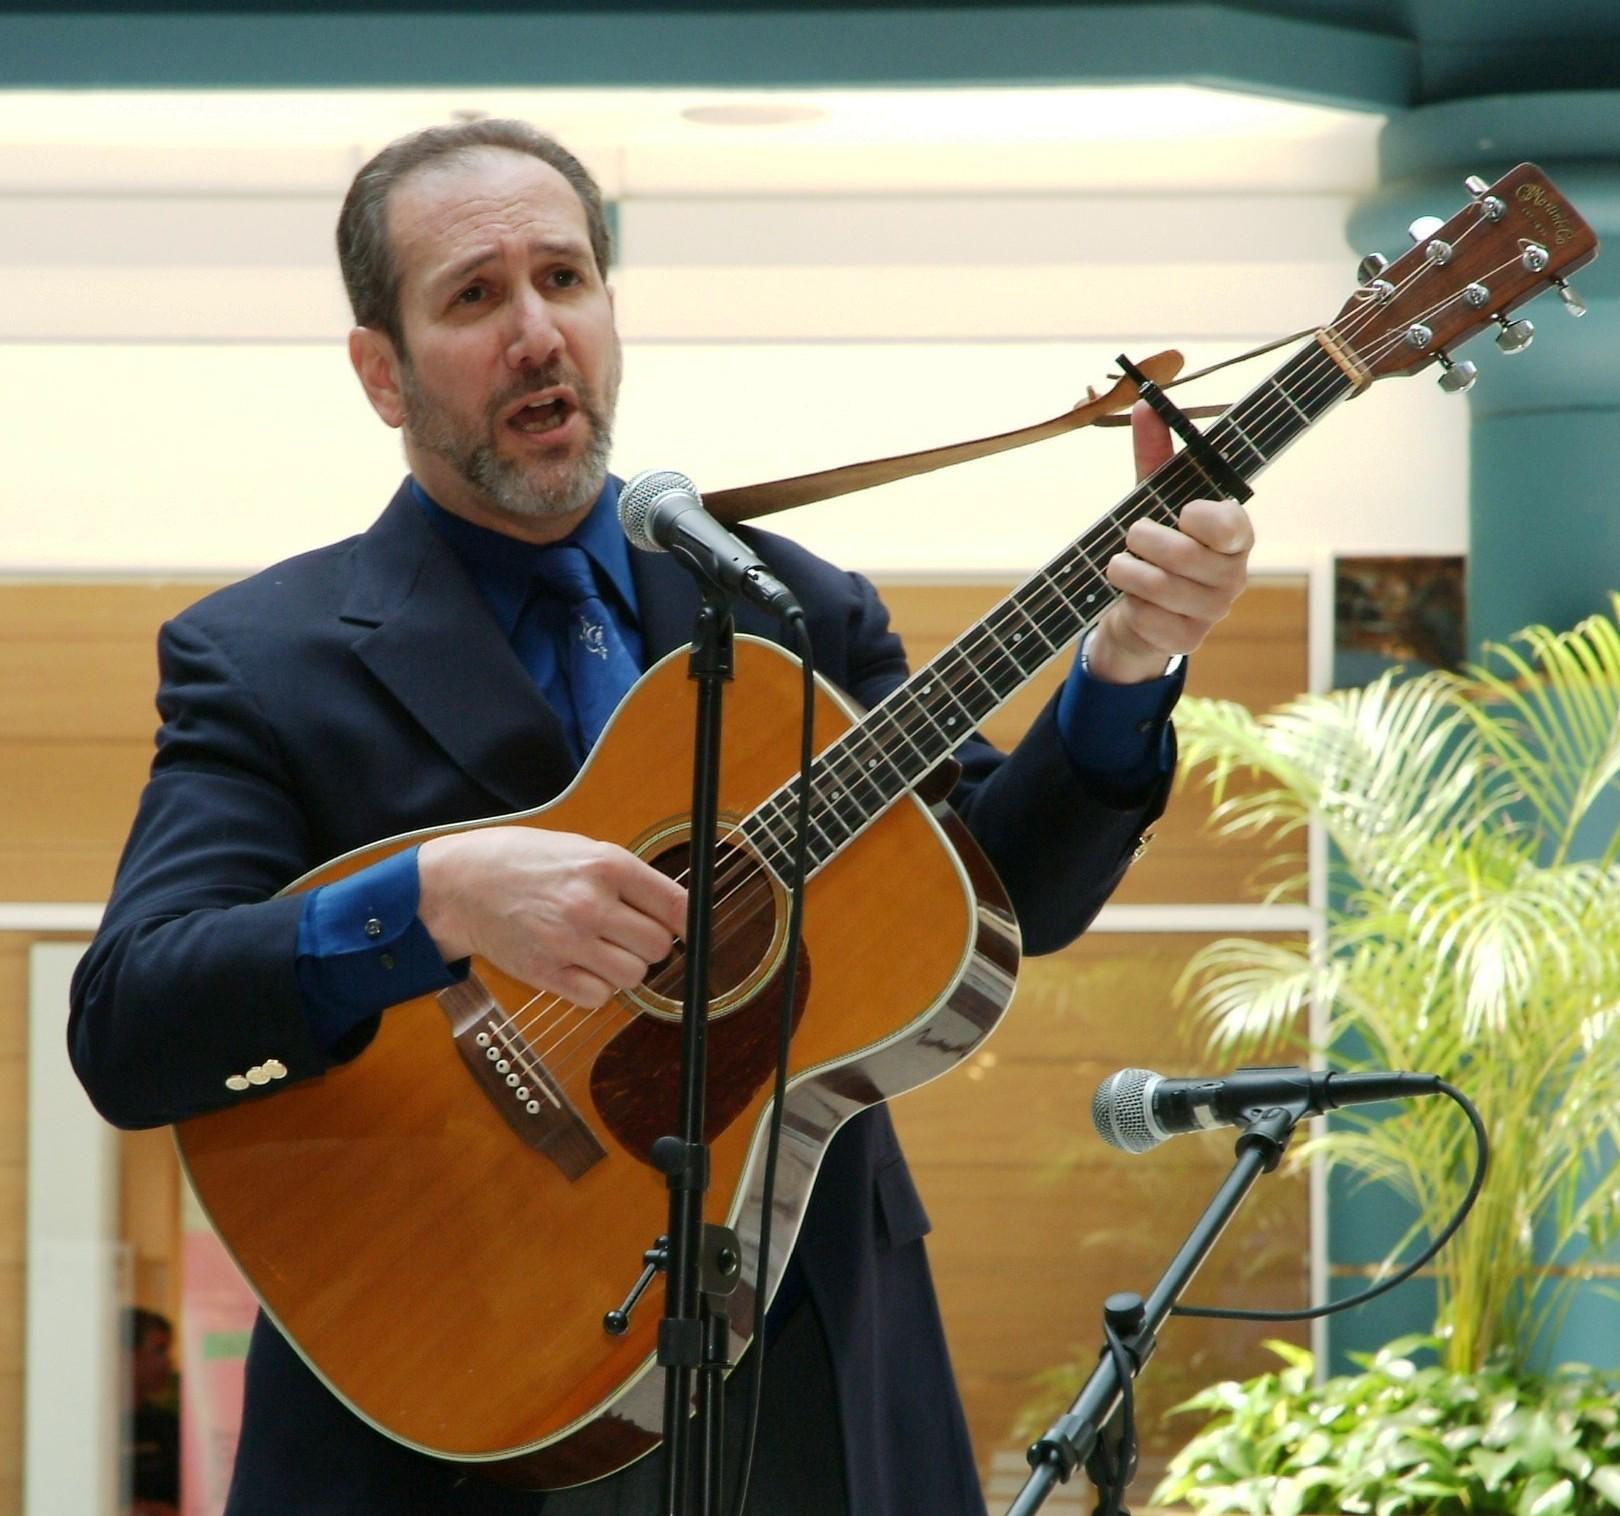 Cantor Stephen Freedman Concert performance